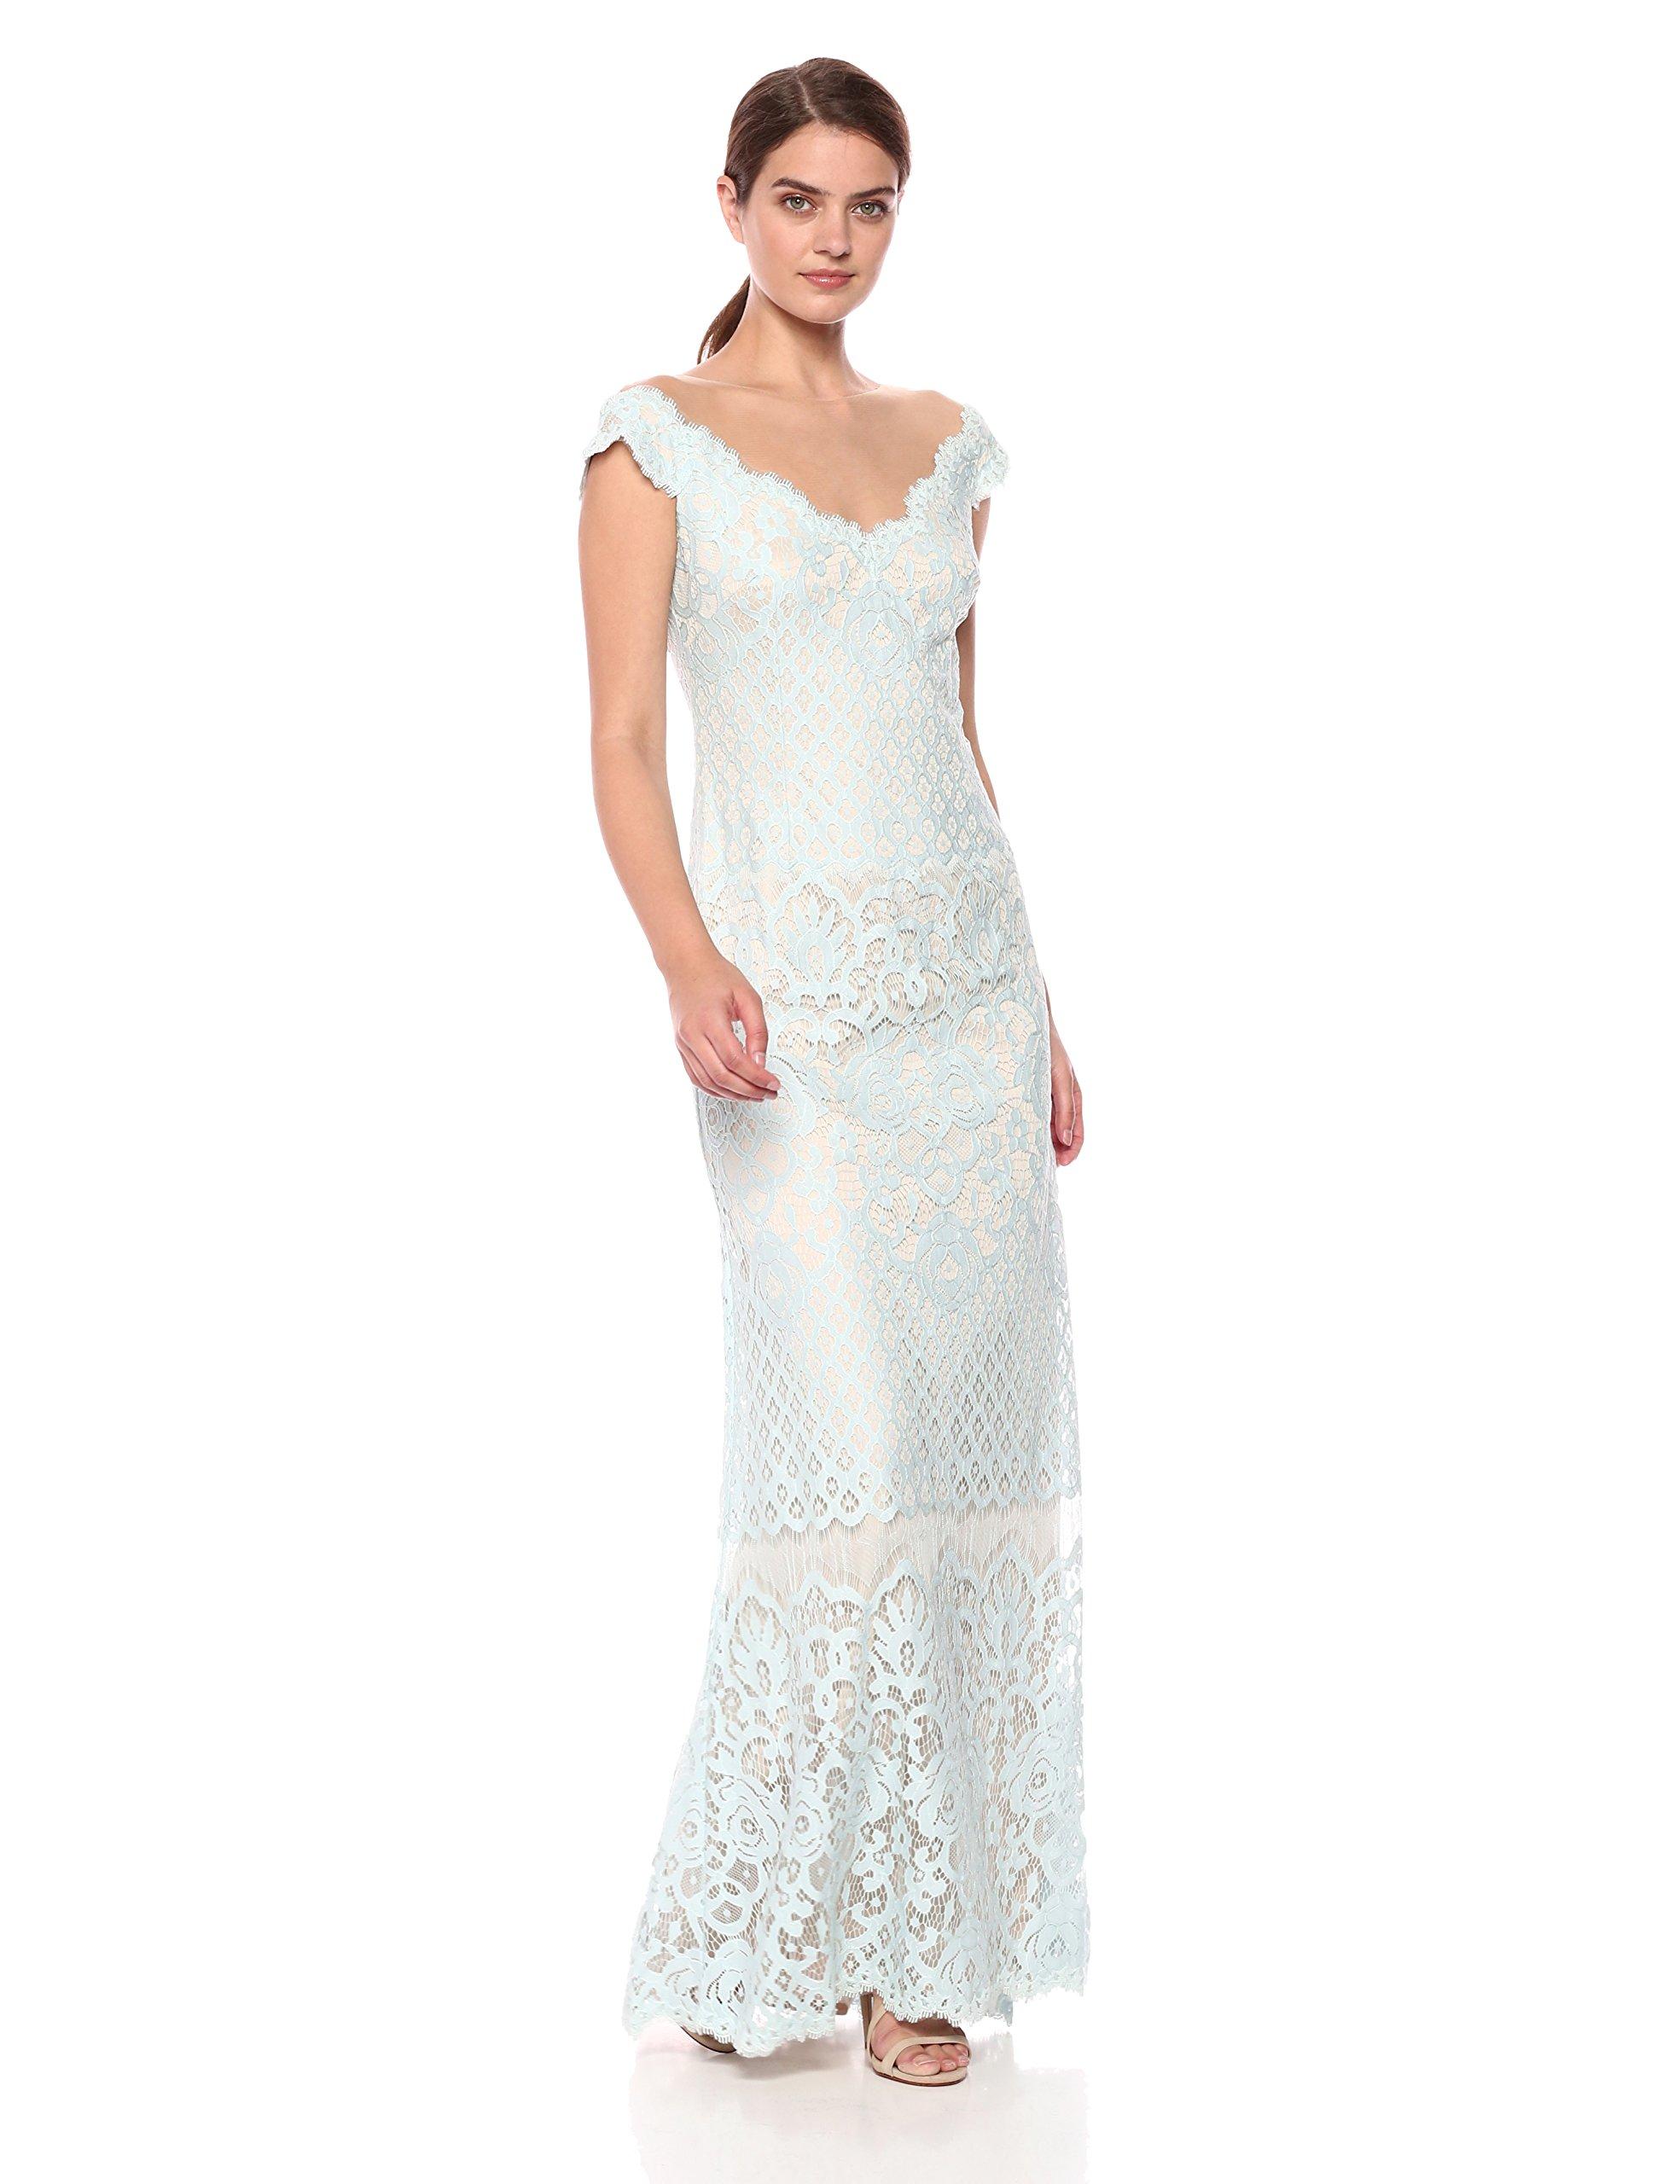 Tadashi Shoji Wedding Dresses Collection Modern Design